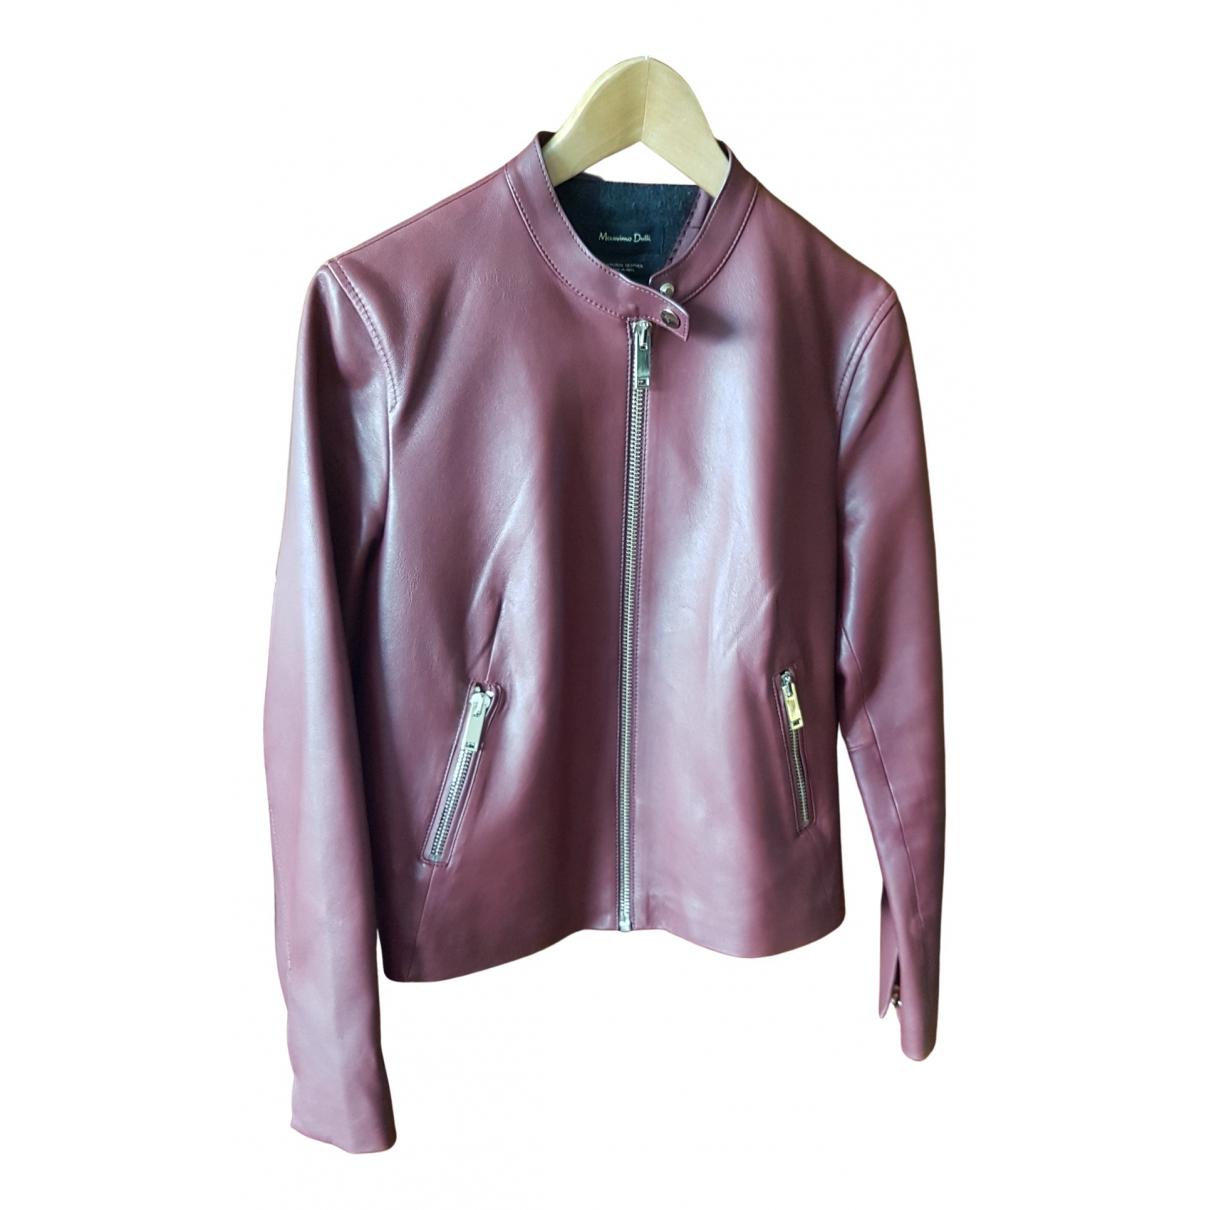 Massimo Dutti \N Burgundy Leather Leather jacket for Women L International